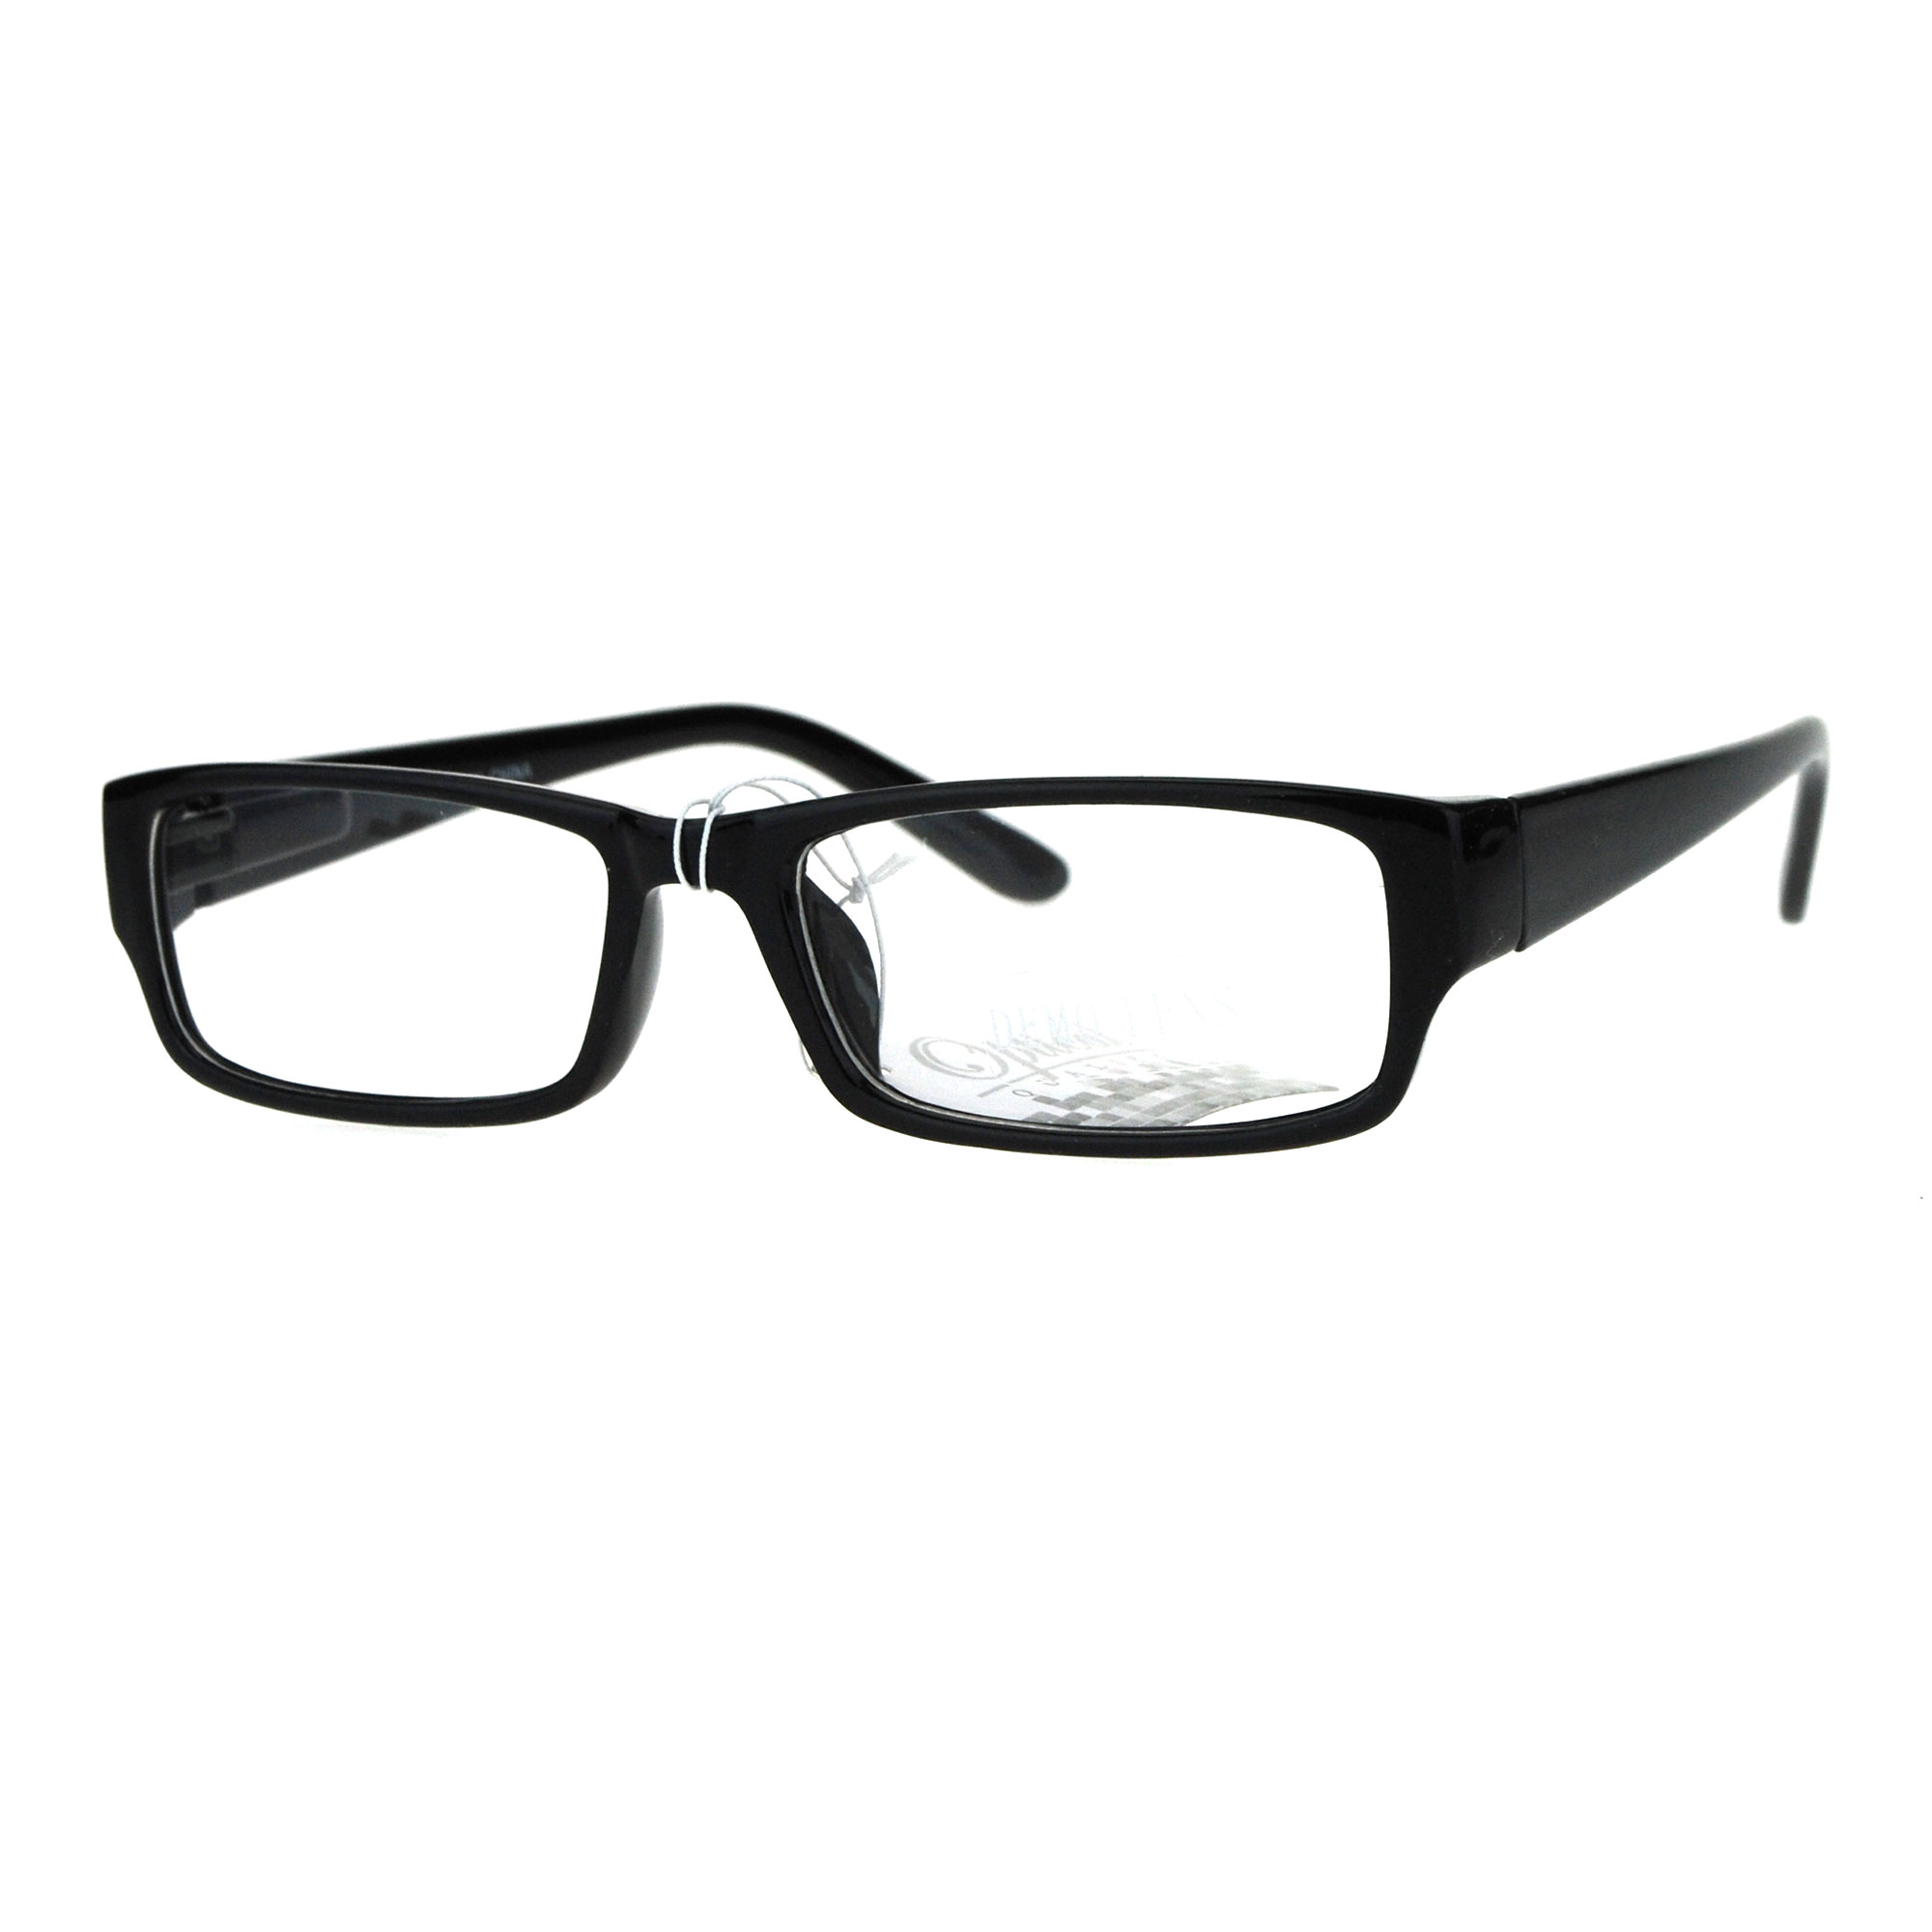 Glasses Narrow Frame : Mens Classic Narrow Rectangular Plastic Clear Lens Eye ...